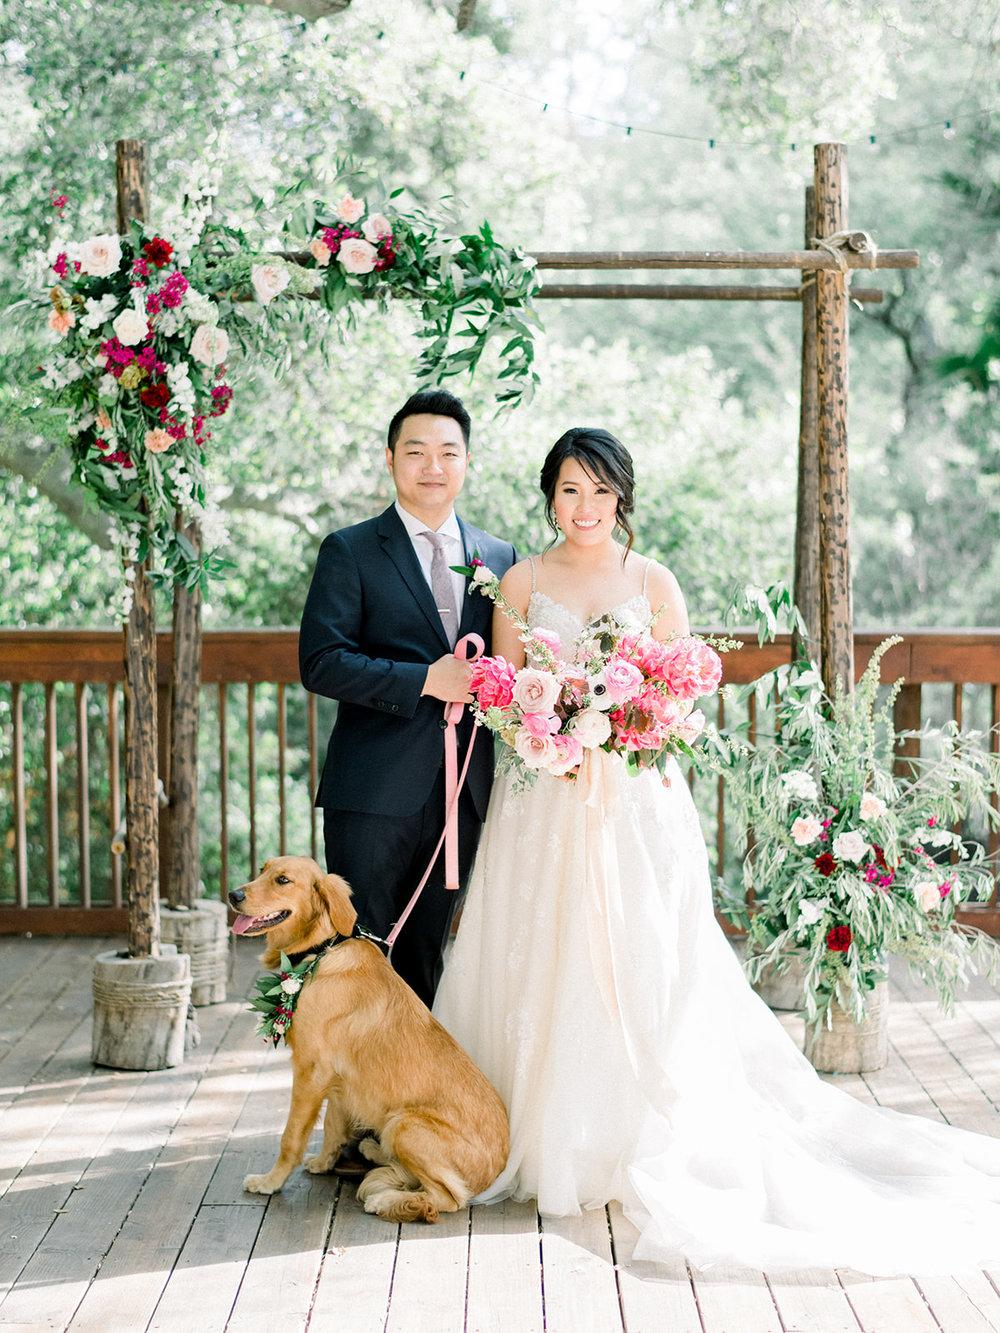 jueunandjon-etherandsmith-wedding-886.jpg